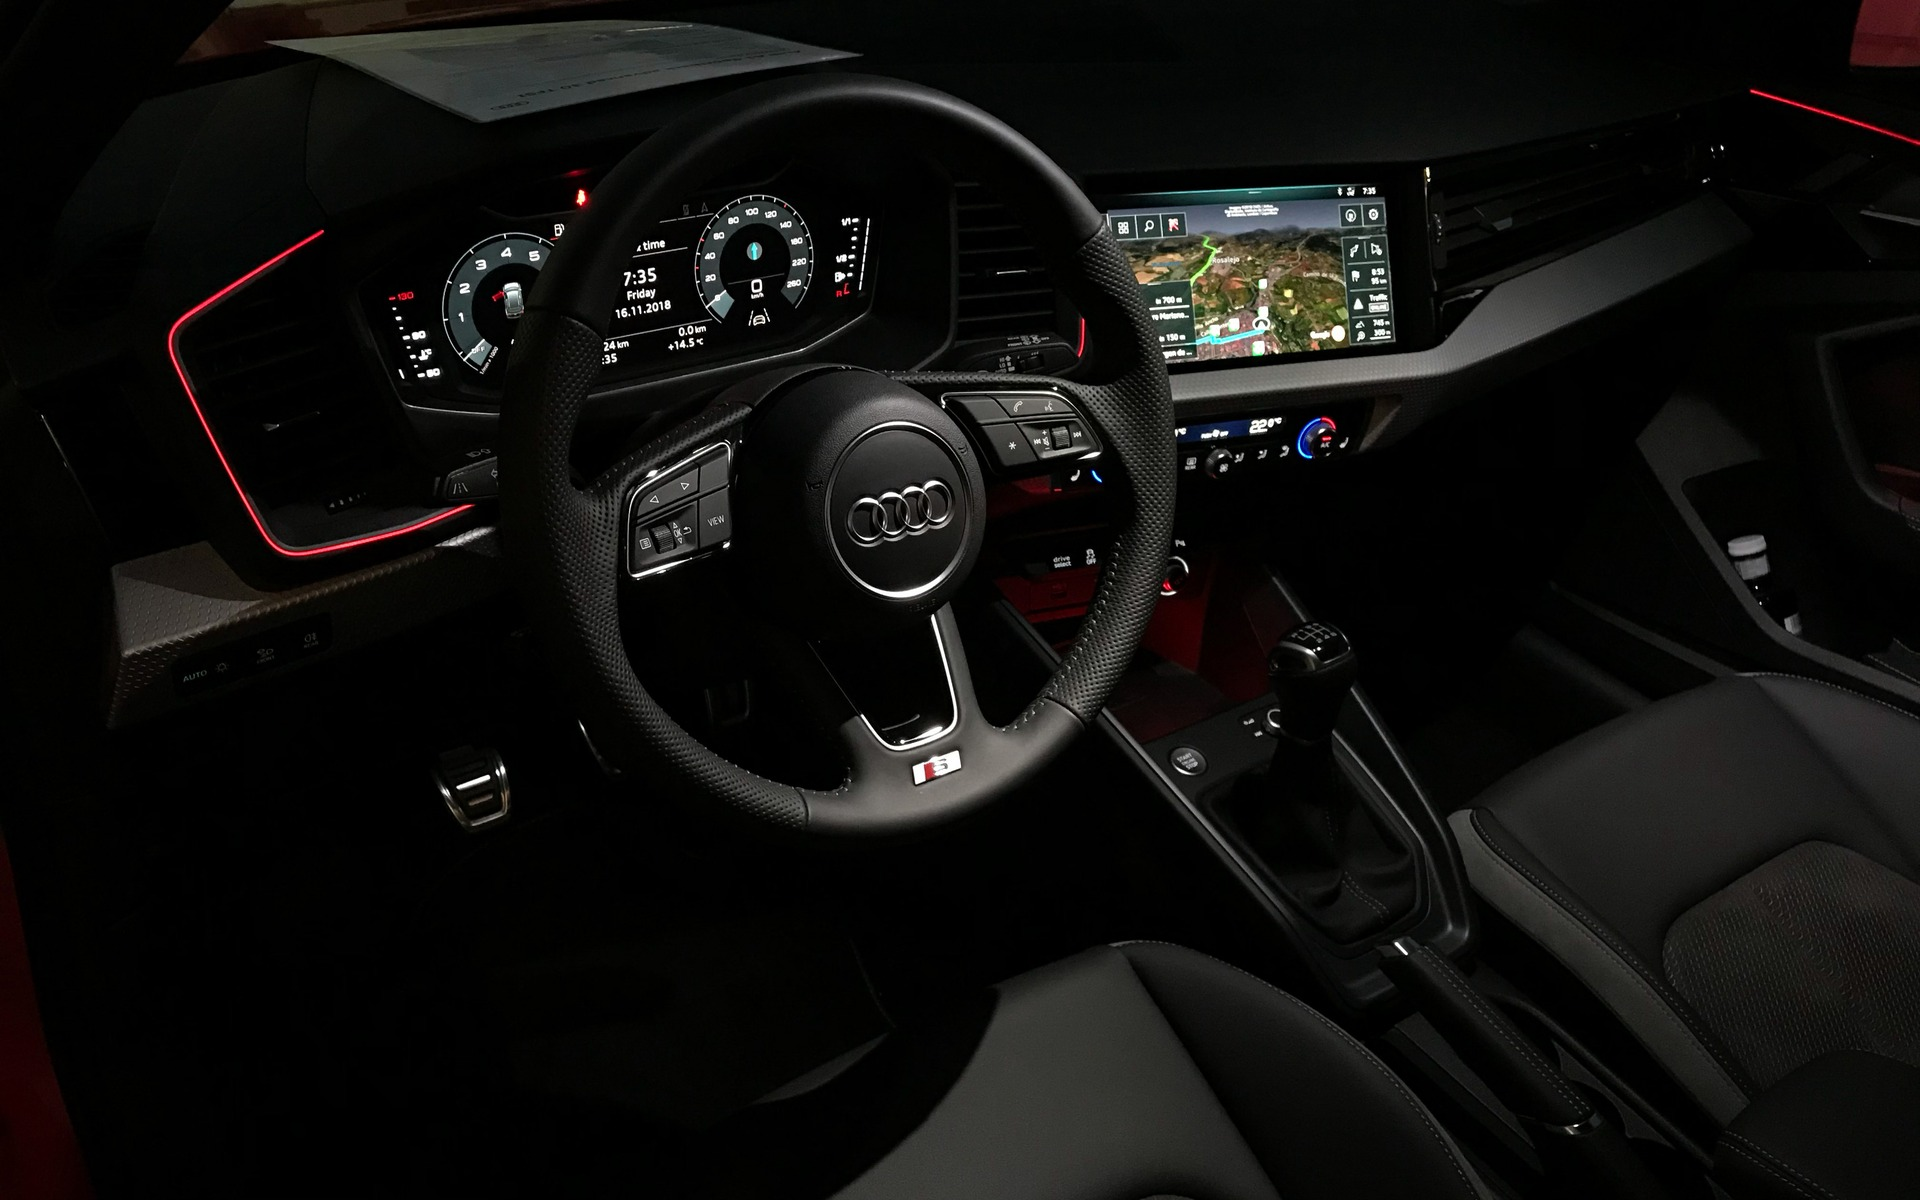 Audi A1 Sportback : la jolie petite qui ne viendra pas 357335_Audi_A1